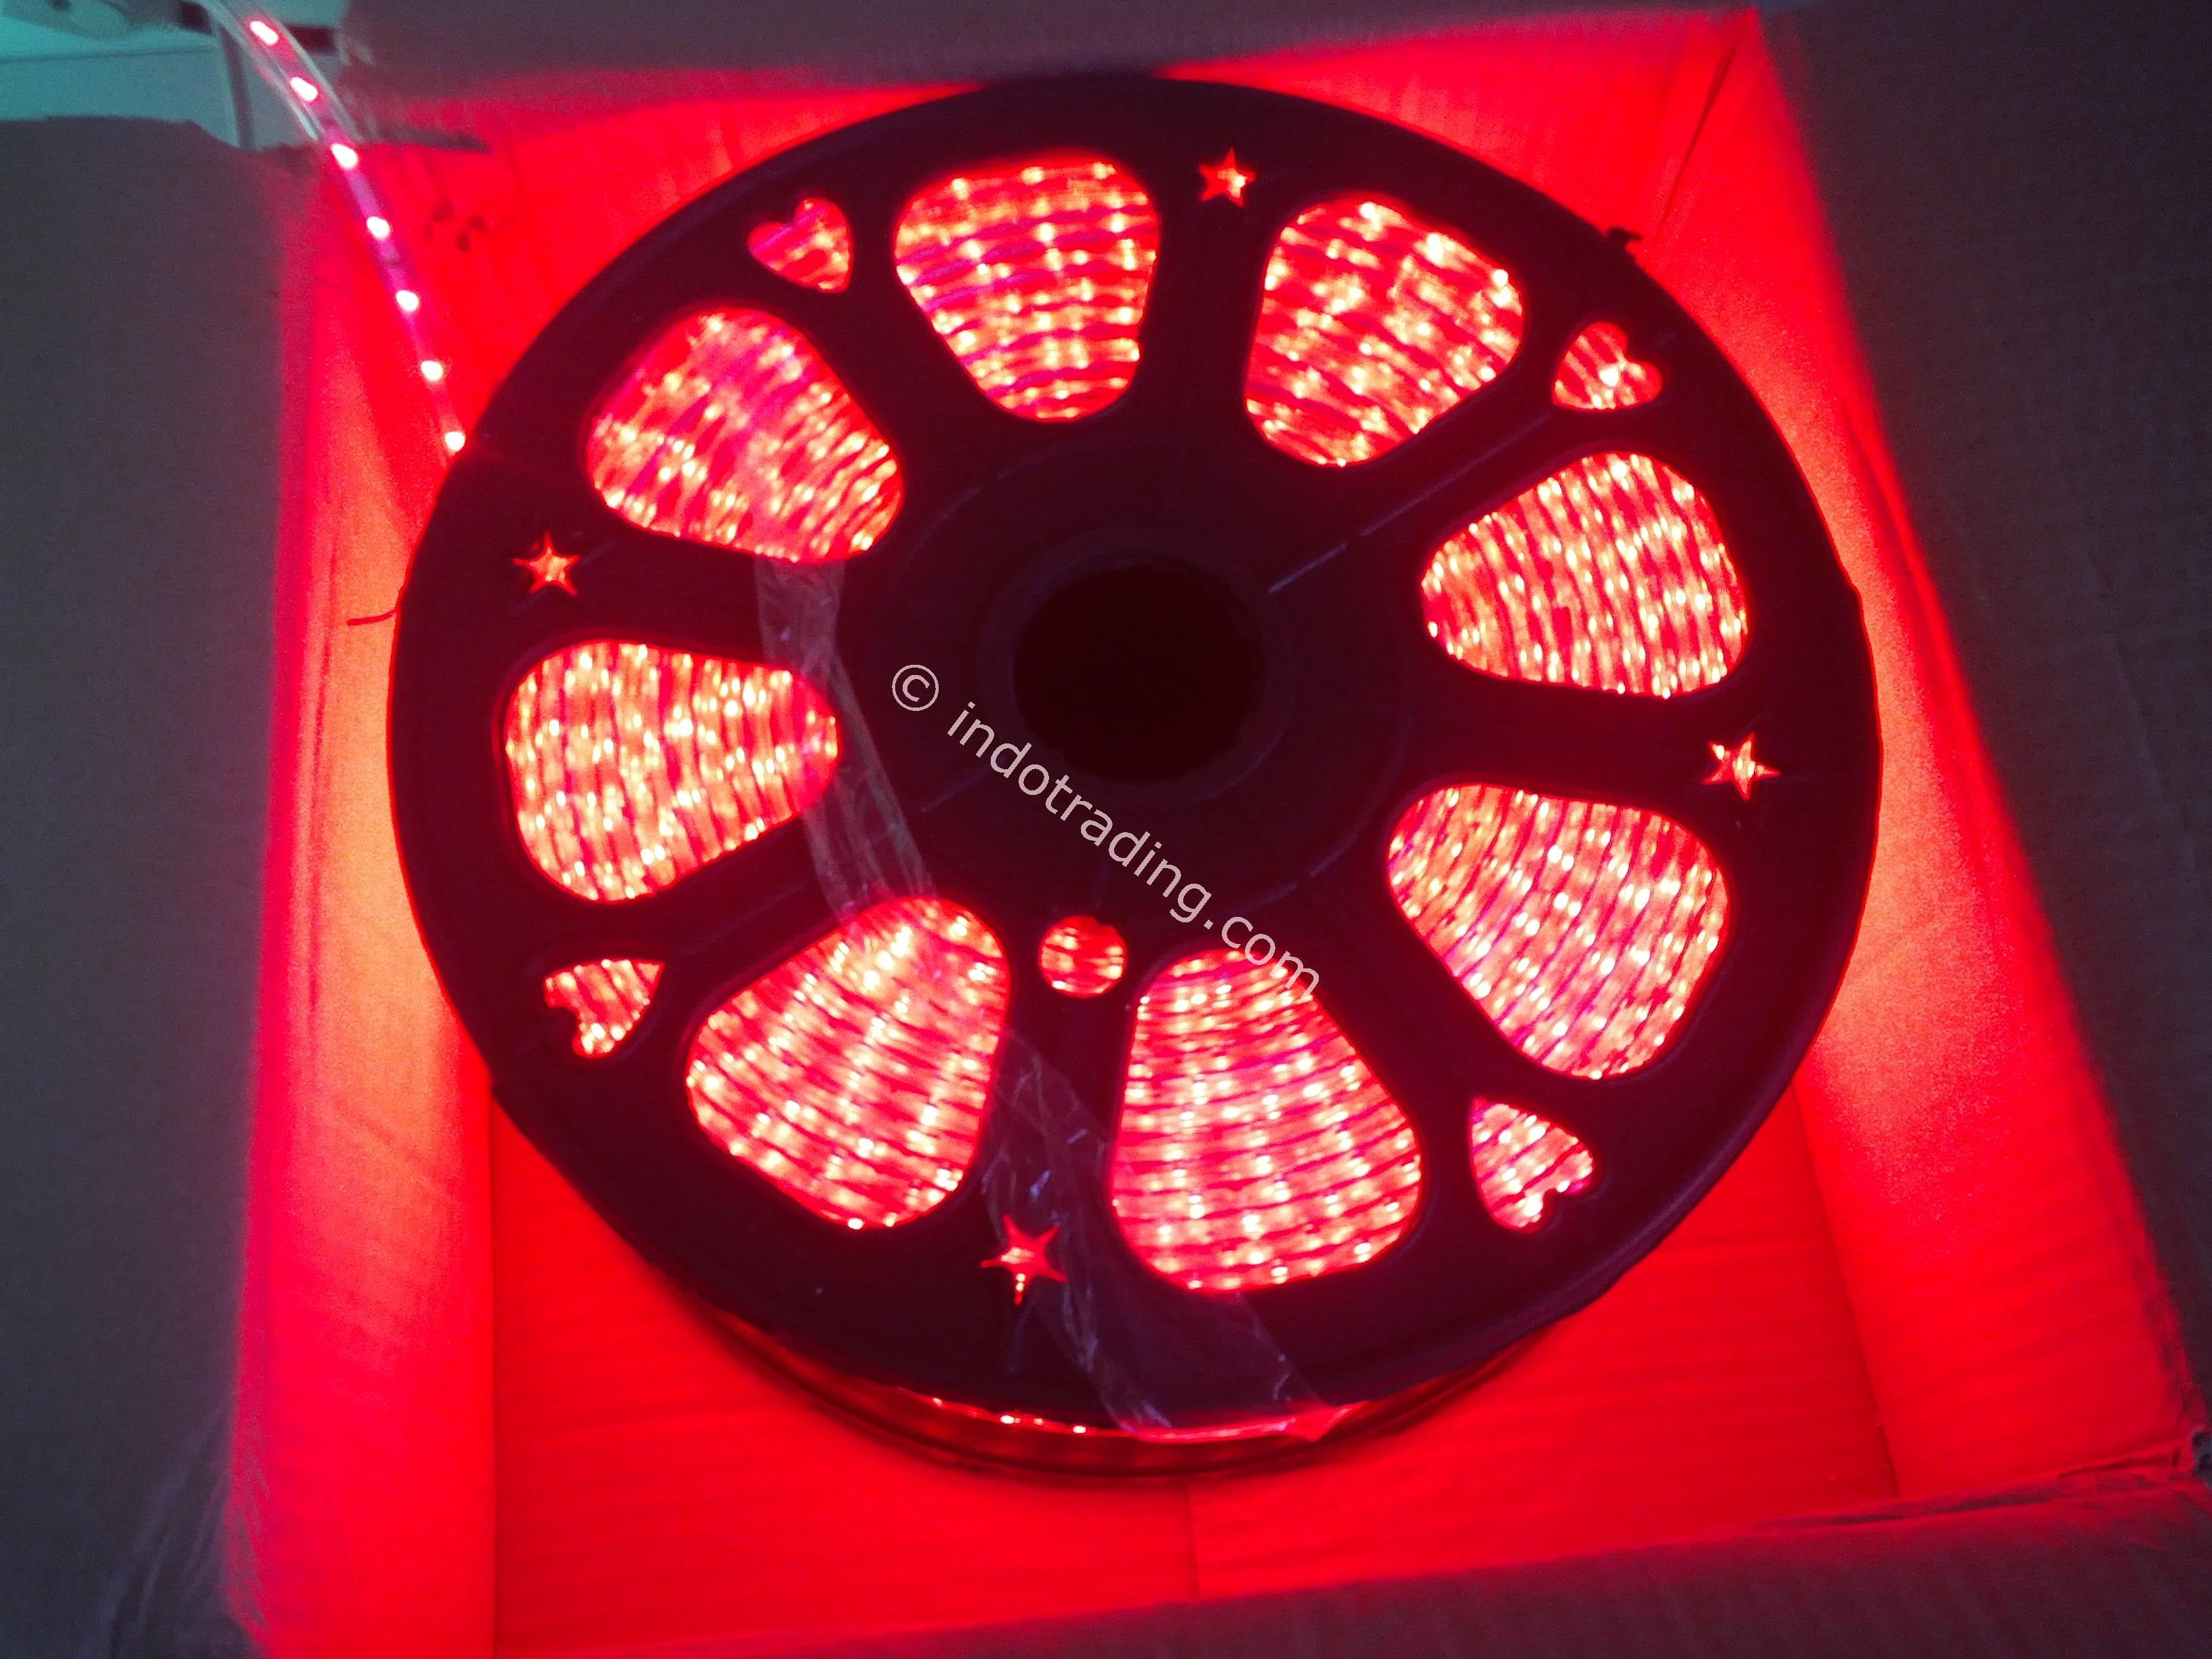 Jual Led String Lights : Jual Lampu Led Rope Light Smd 3528 Outdoor Merah100 Meter Harga Murah Jakarta oleh PT Oscar ...